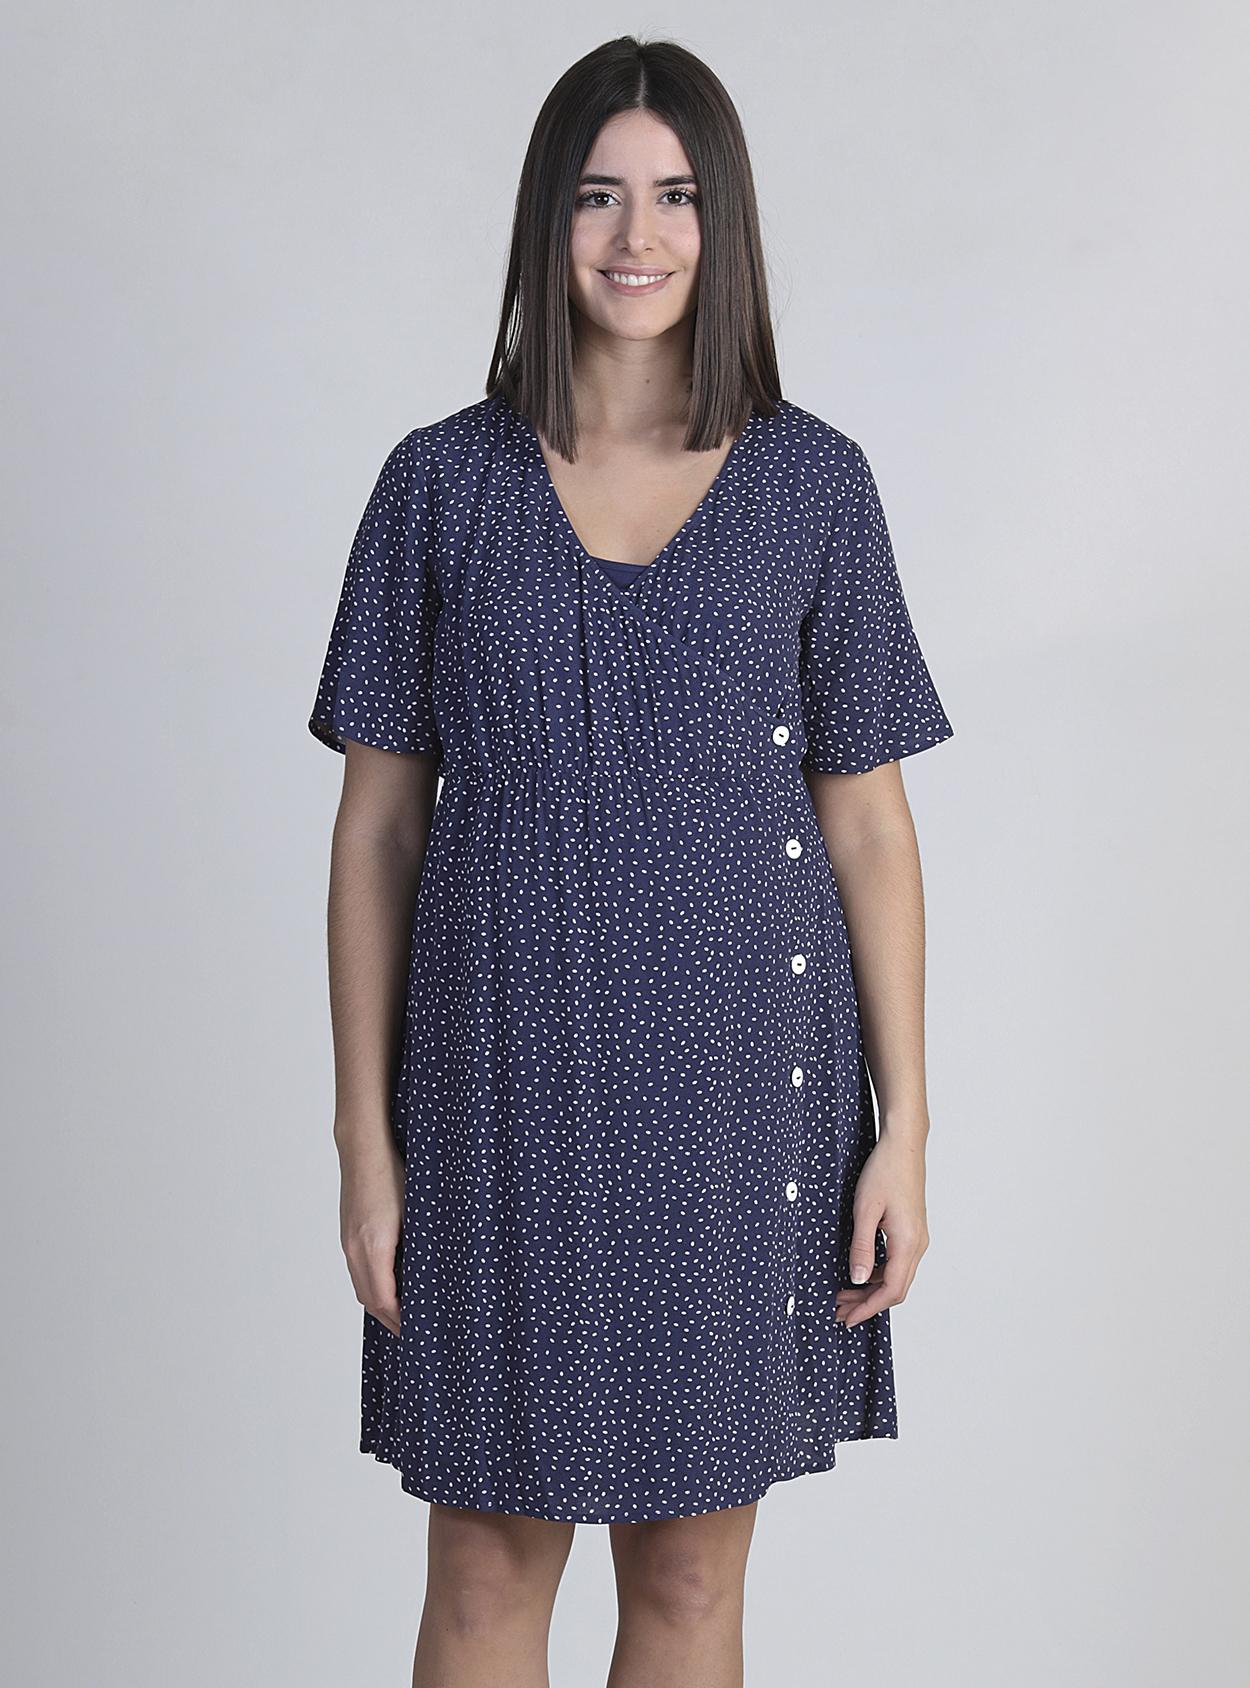 Vestido lactancia cruzado con botones azul